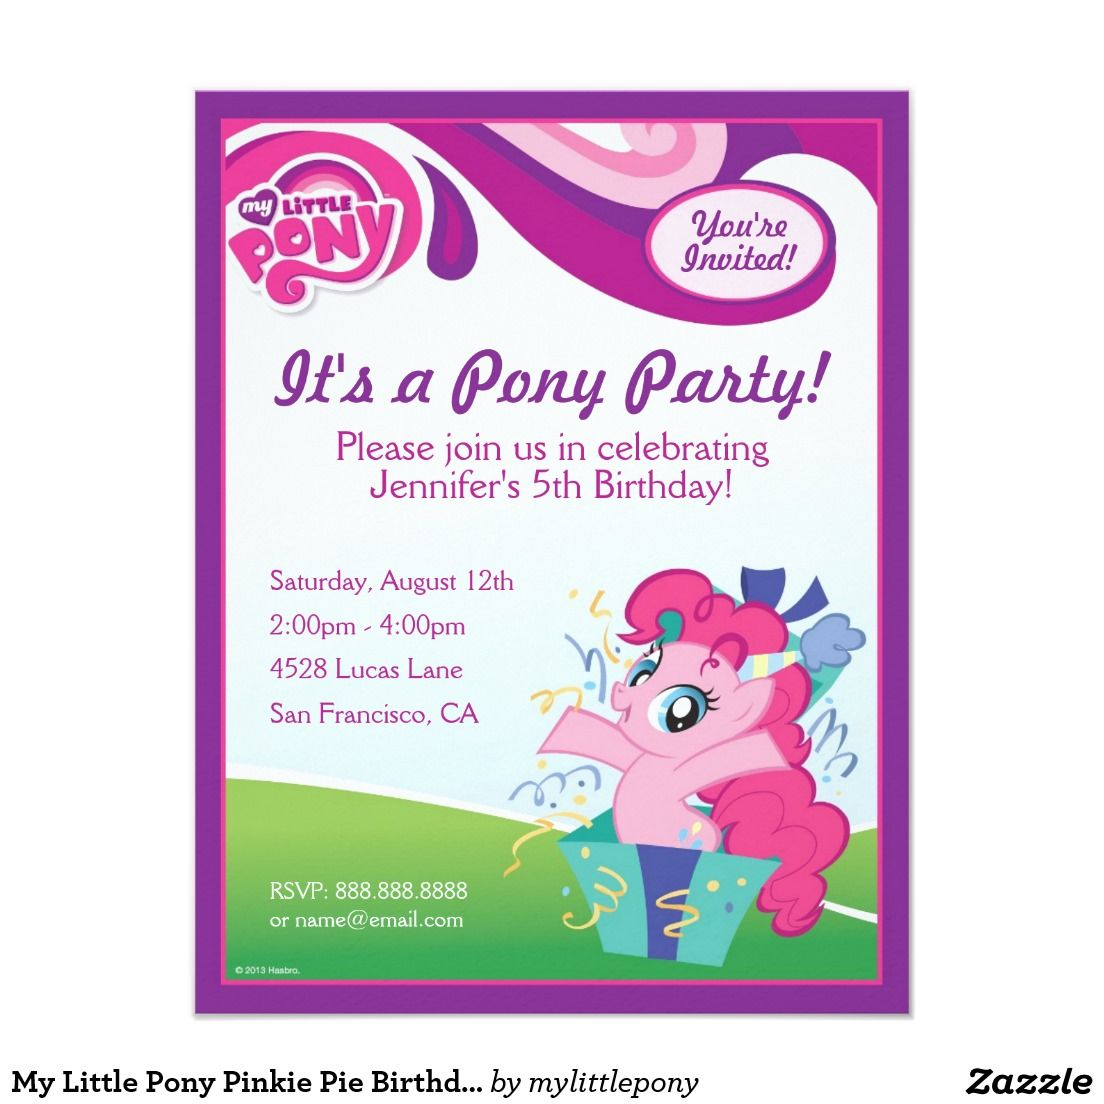 My Little Pony Pinkie Pie Birthday Party Invitation   Party Ideas ...